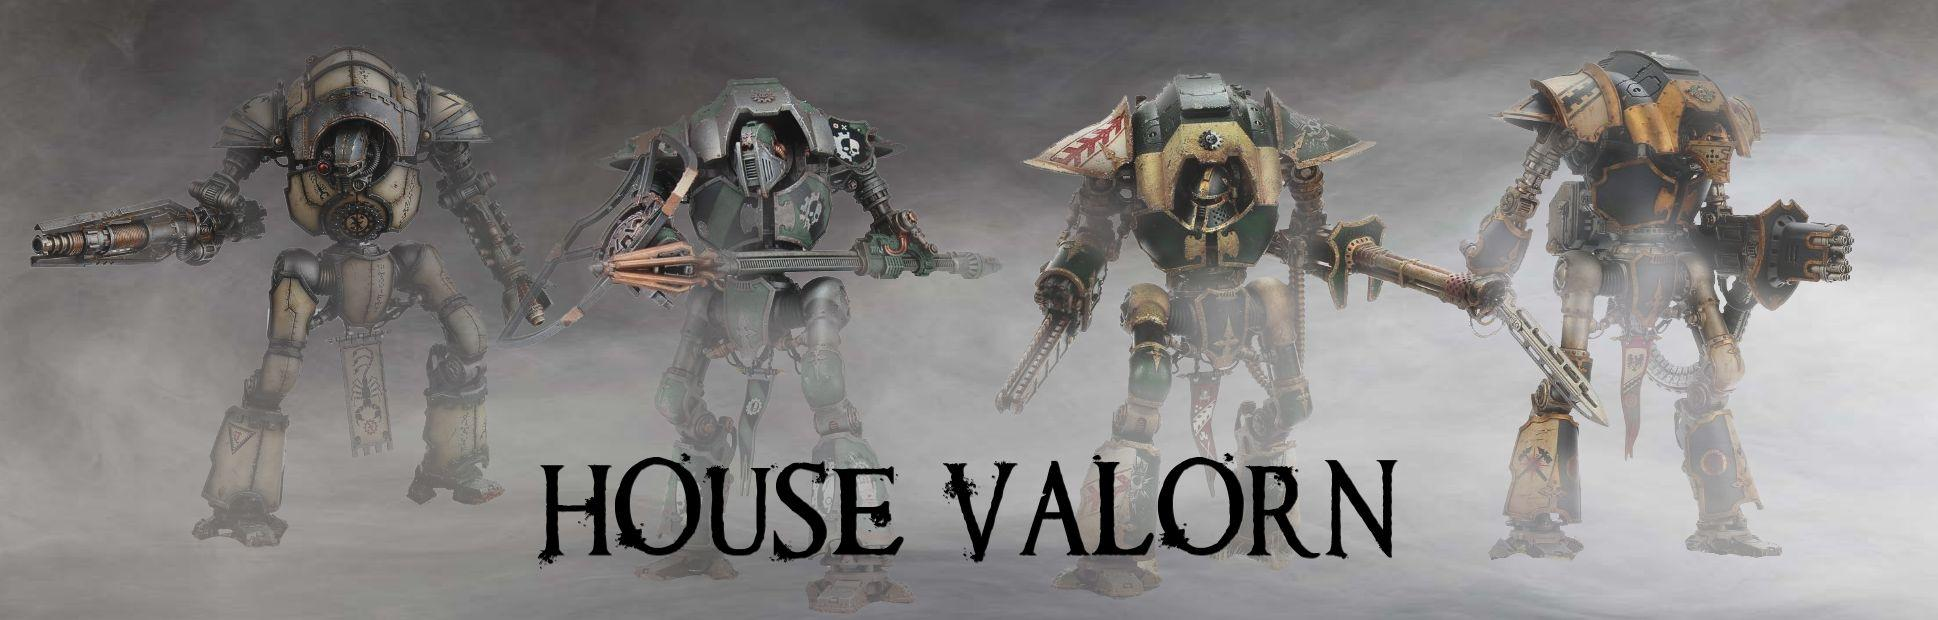 Imperial Knights, Mecha, Titan, Walkers